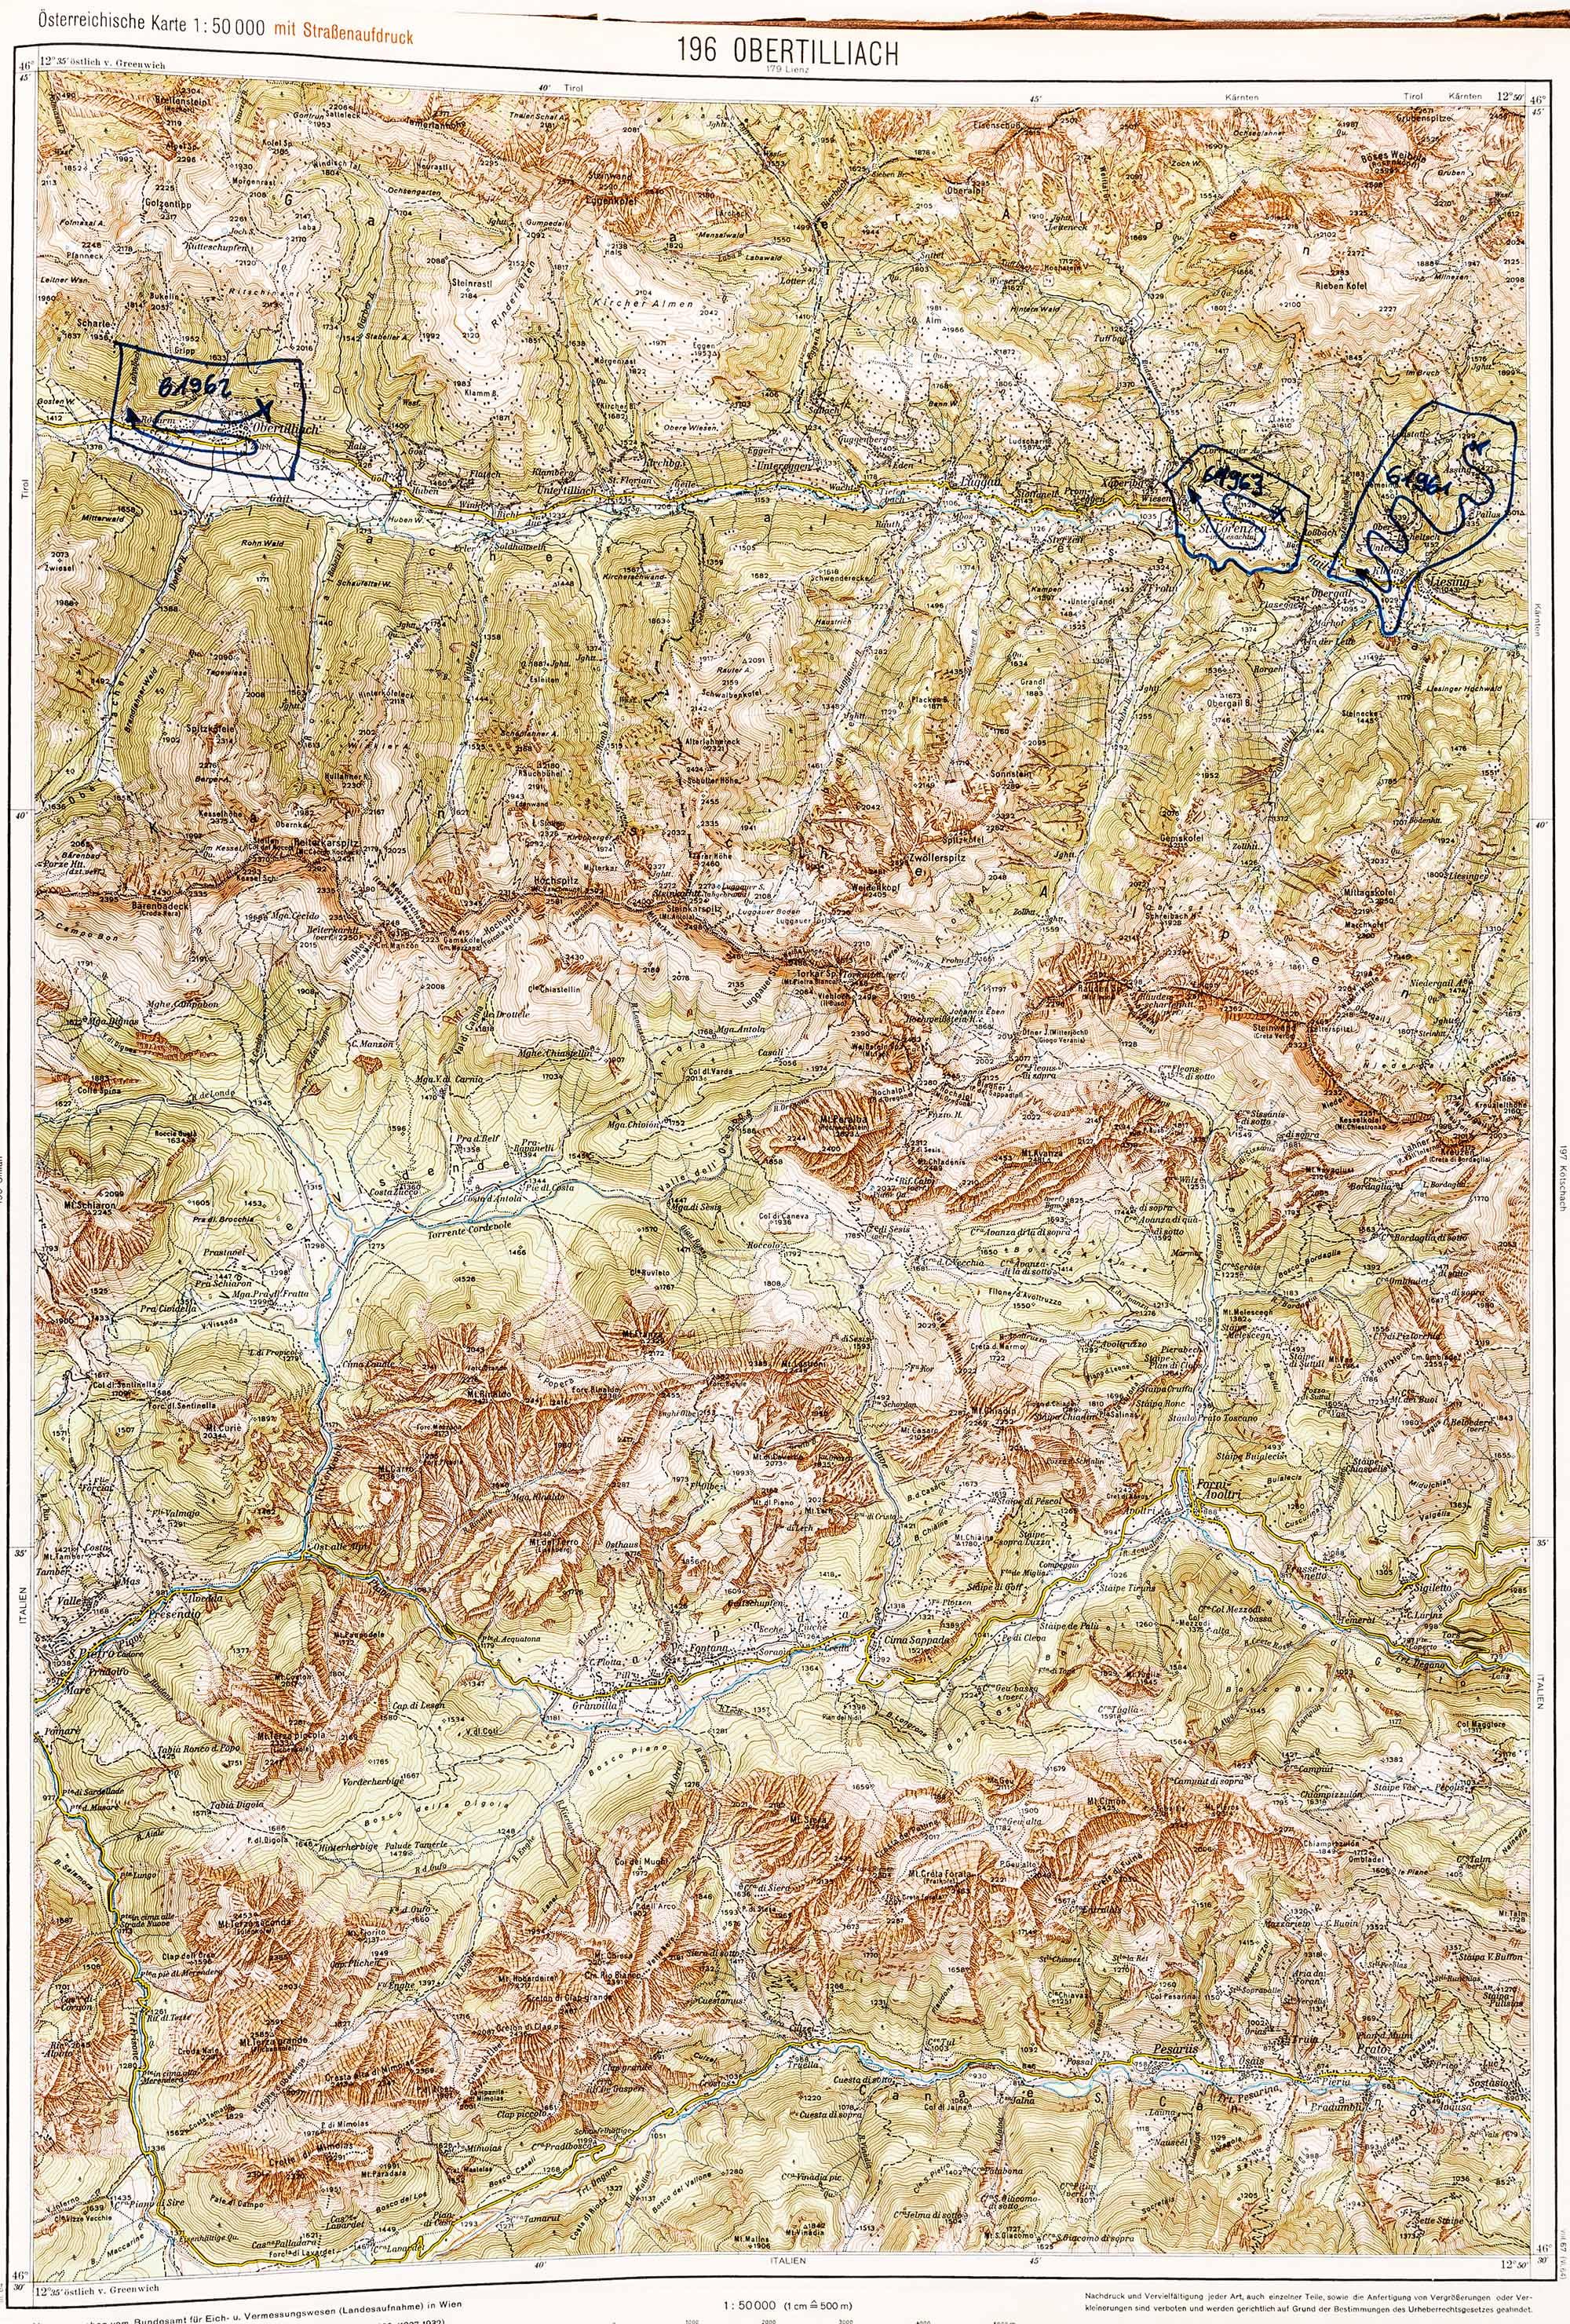 1975-1979 Karte 196